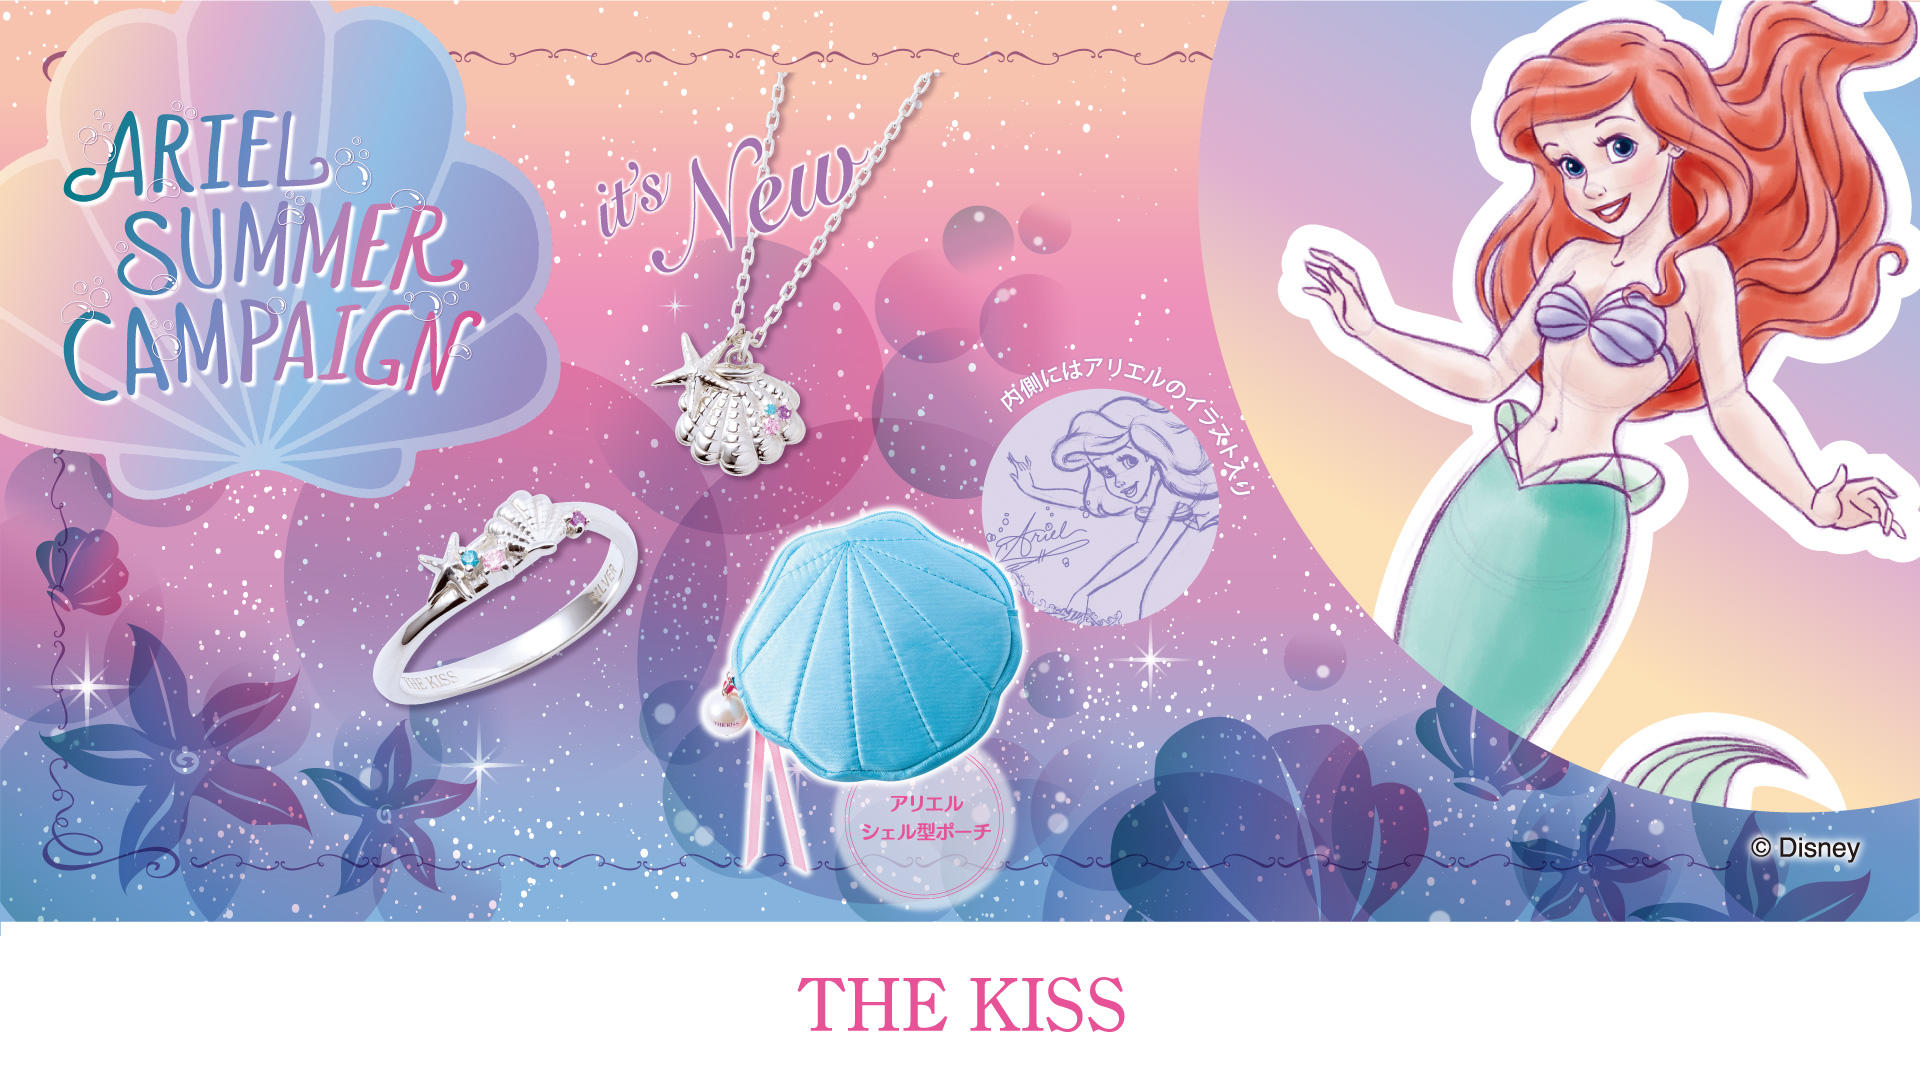 The Kissディズニープリンセスコレクション 8 11 金 より アリエル